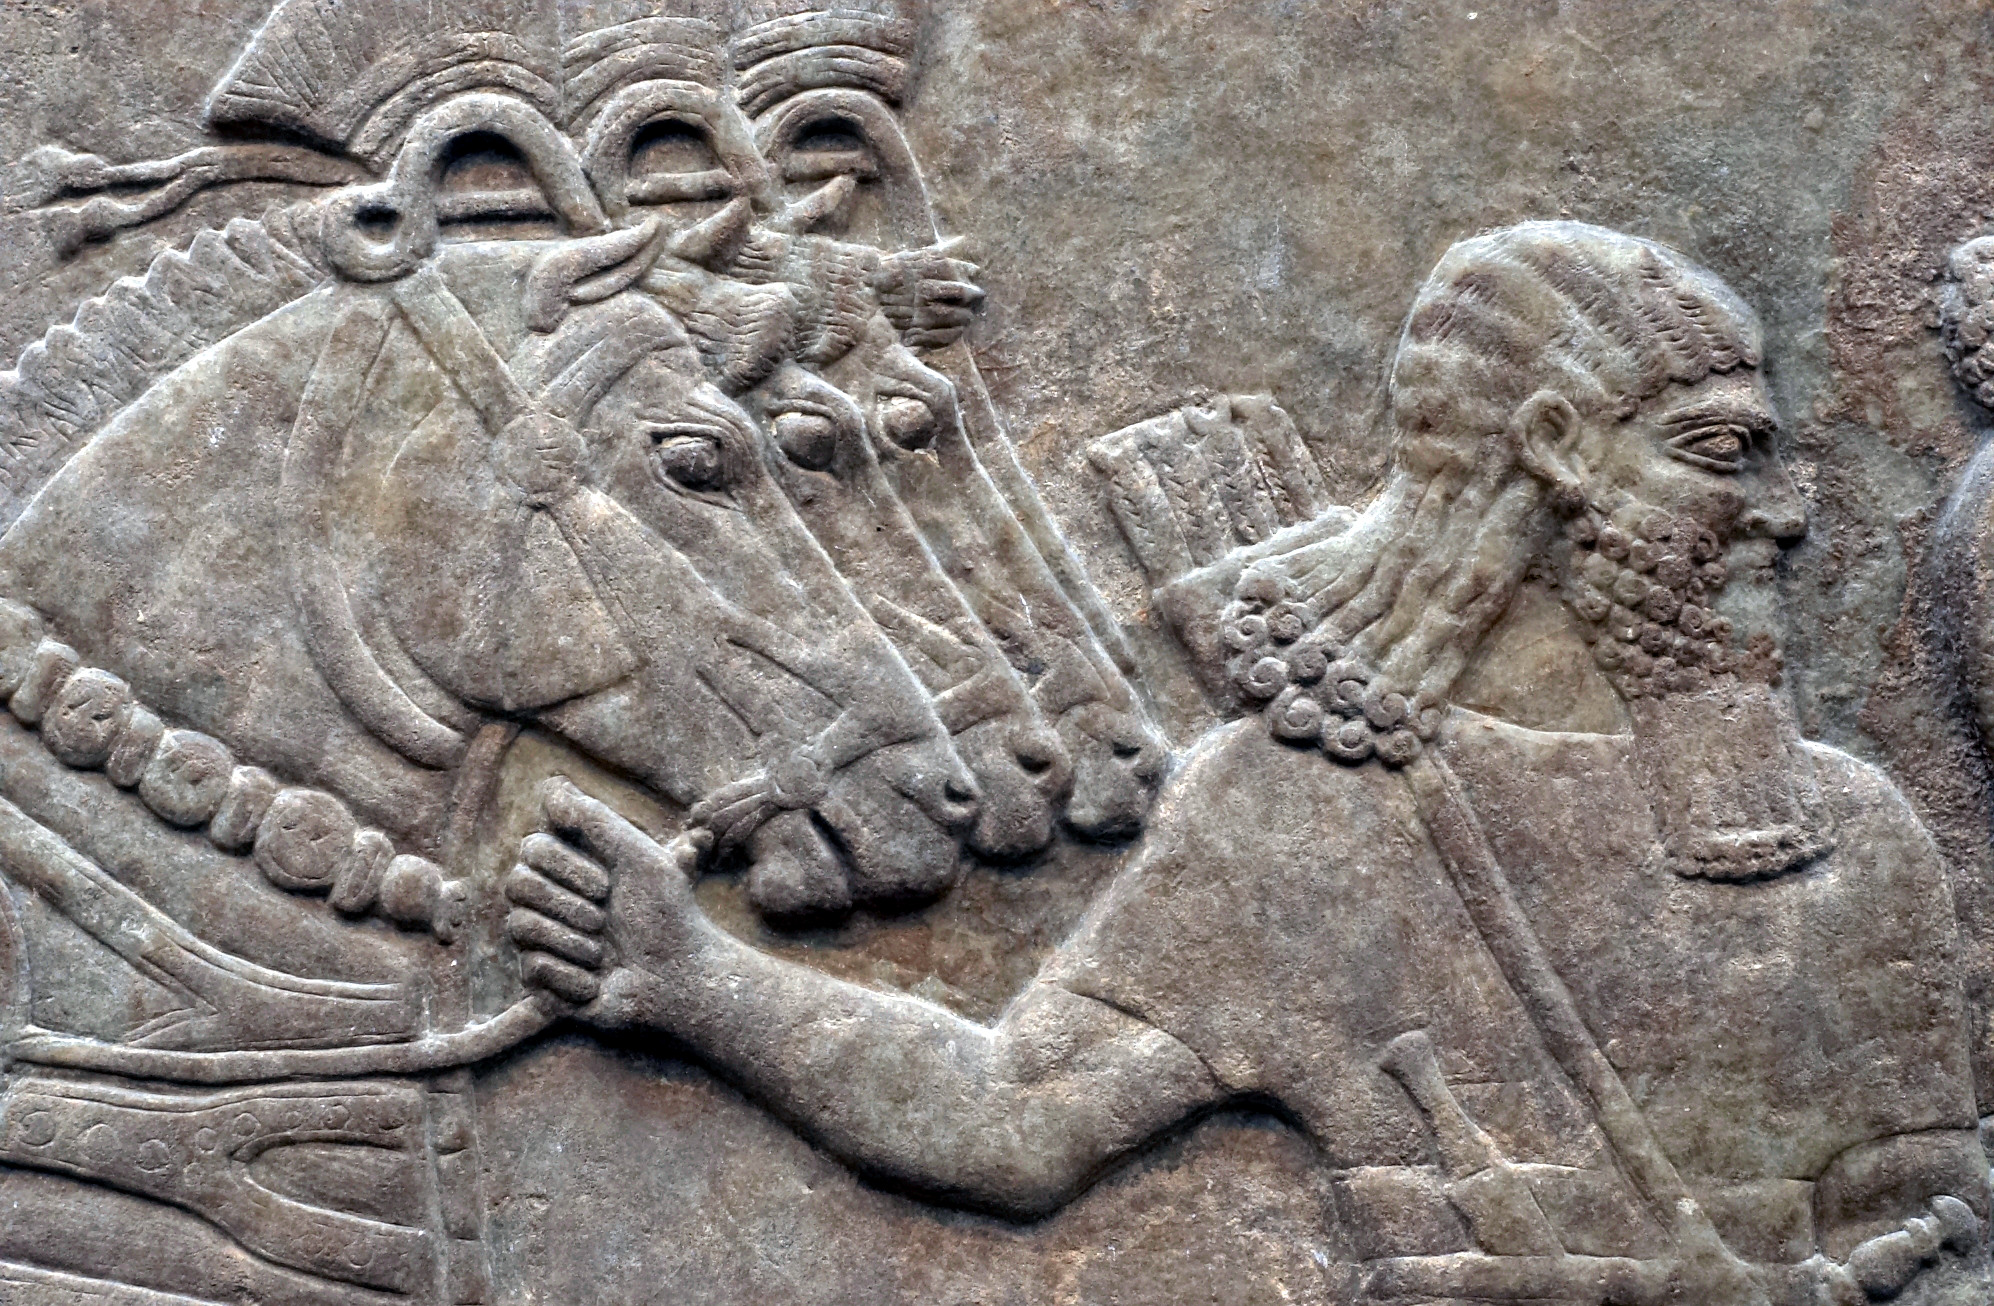 https://upload.wikimedia.org/wikipedia/commons/f/fe/Nimrud_Palace_Reliefs_2.jpg